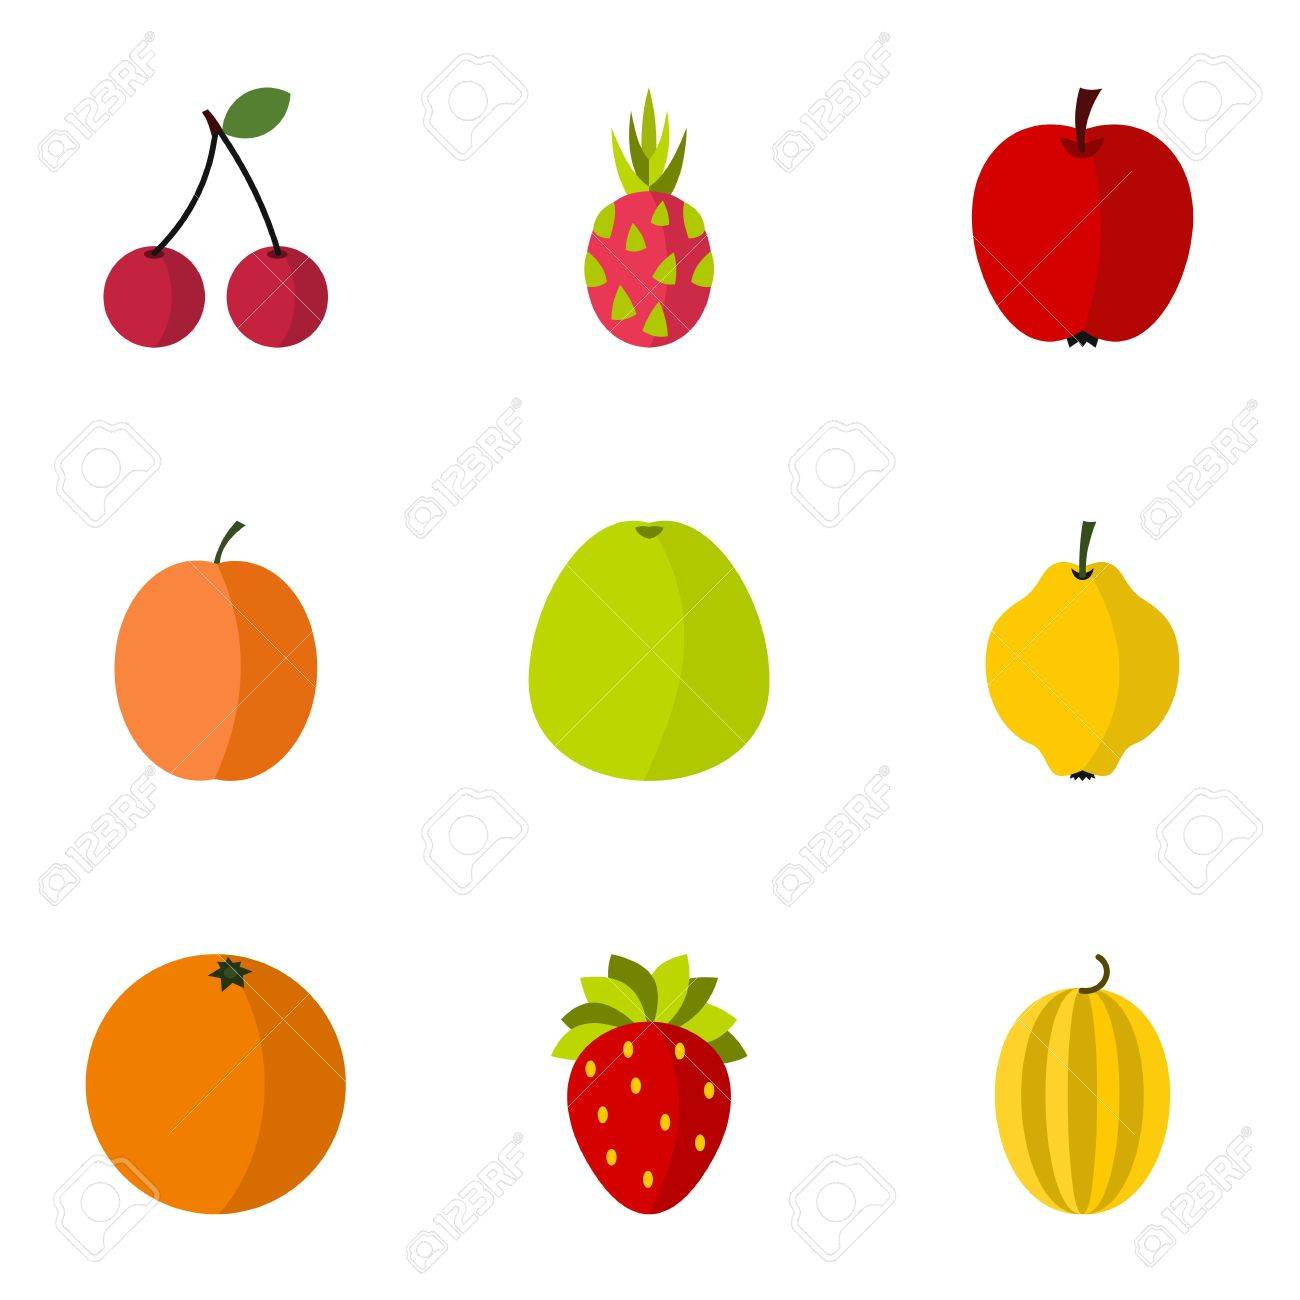 types of fruit icons set flat illustration of 9 types of fruit rh 123rf com fruit vector background free fruit vector background free